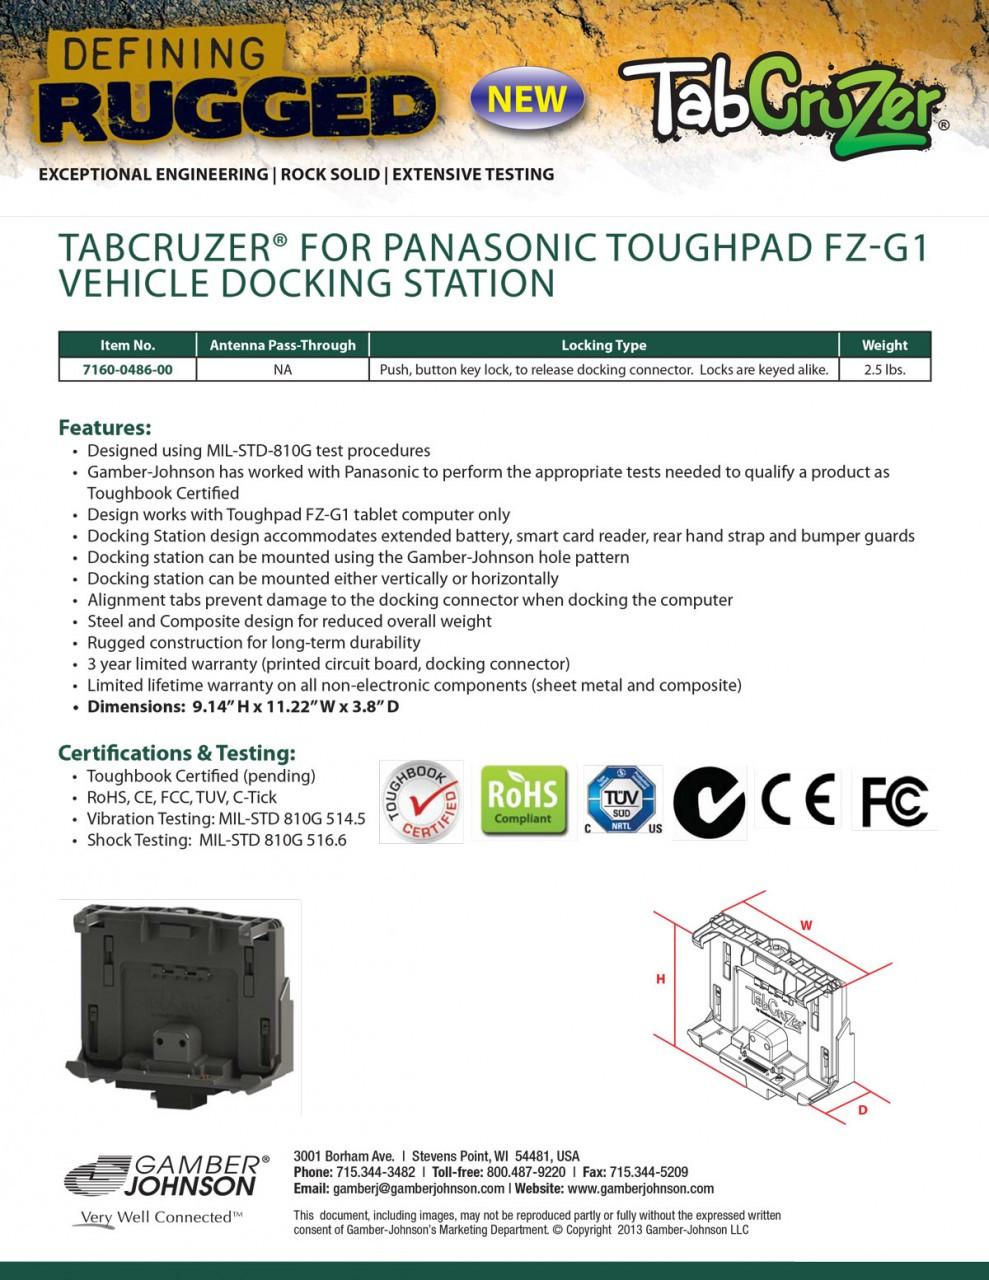 TabCruzer® Panasonic Toughpad FZ-G1 Vehicle Docking Station by Gamber-Johnson